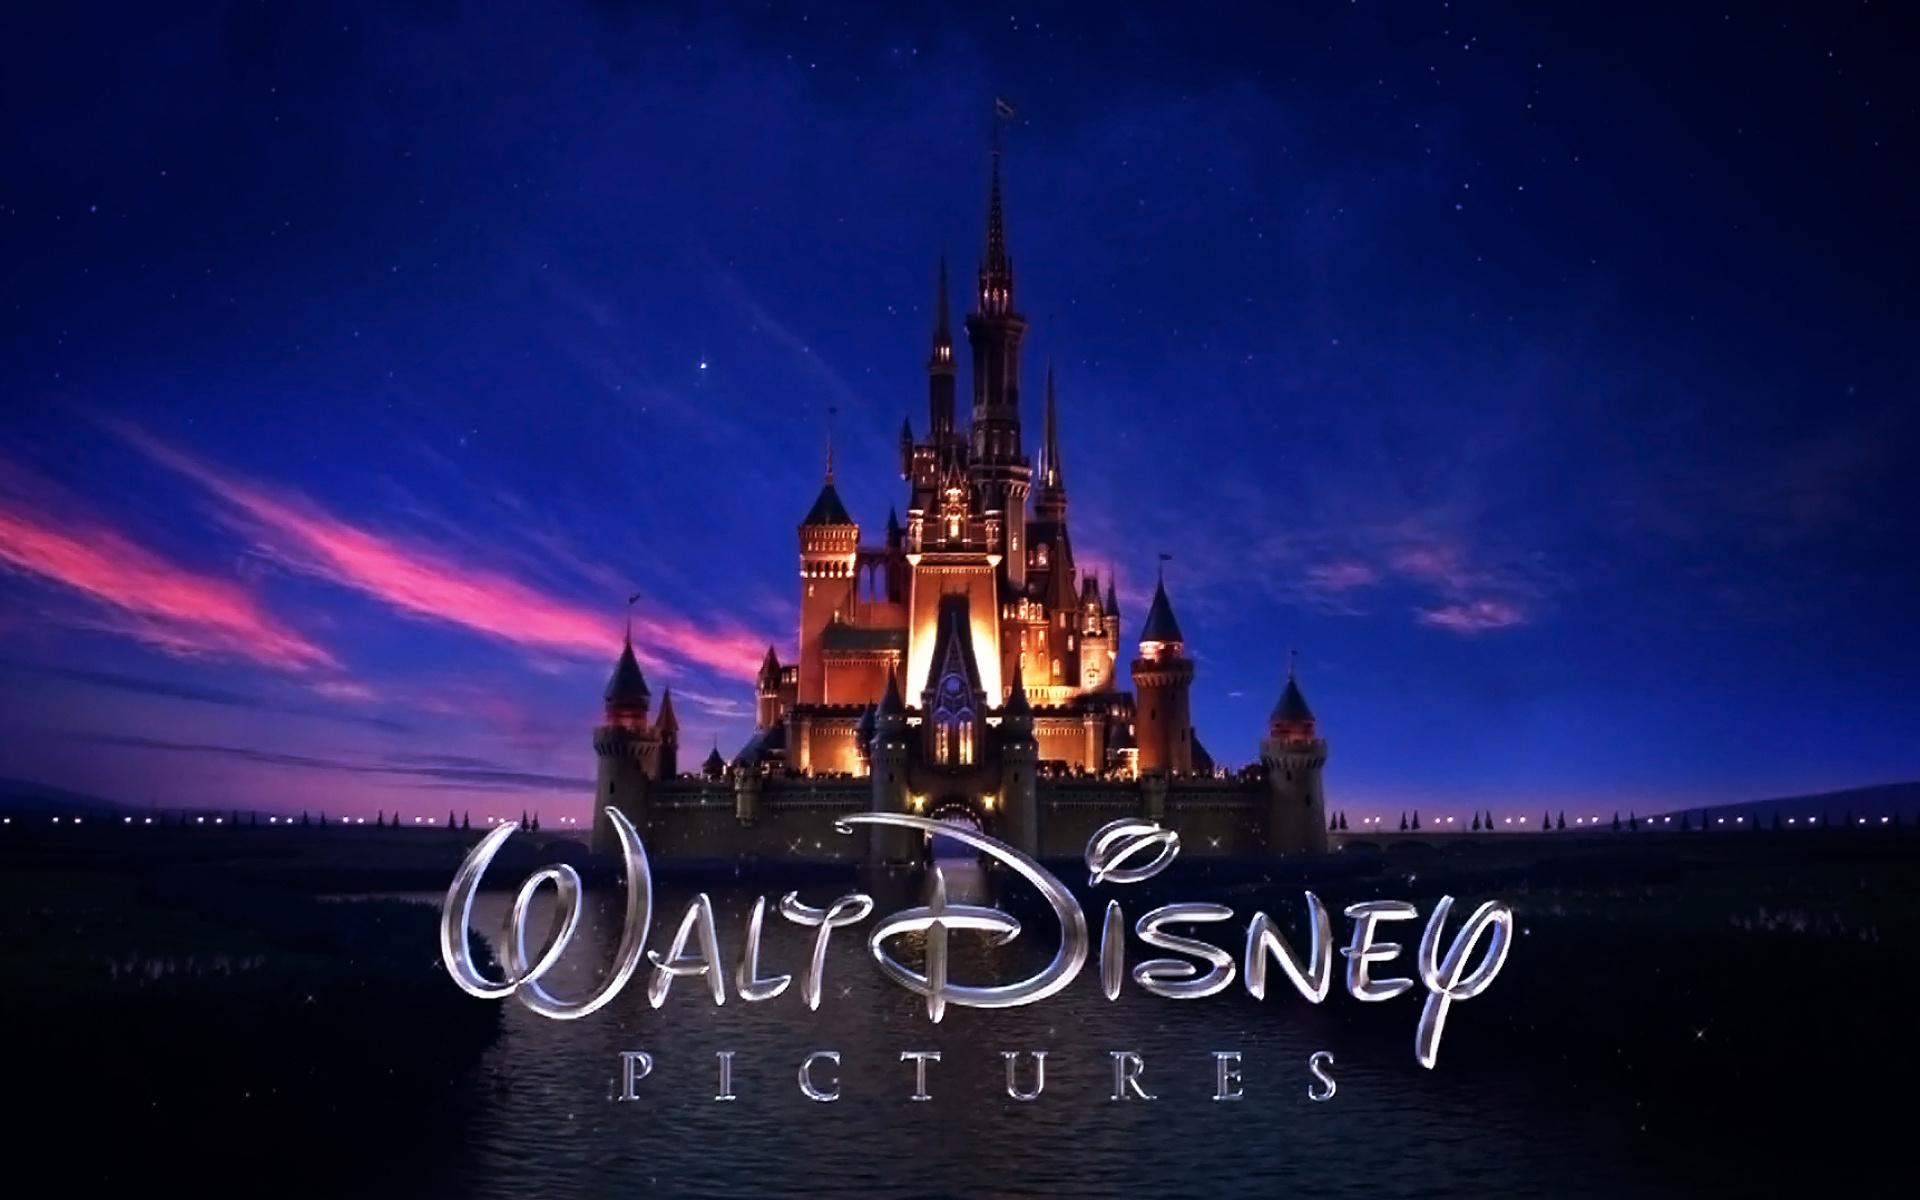 Walt Disney Pictures HD Desktop Wallpaper HD Desktop Wallpaper 1920x1200